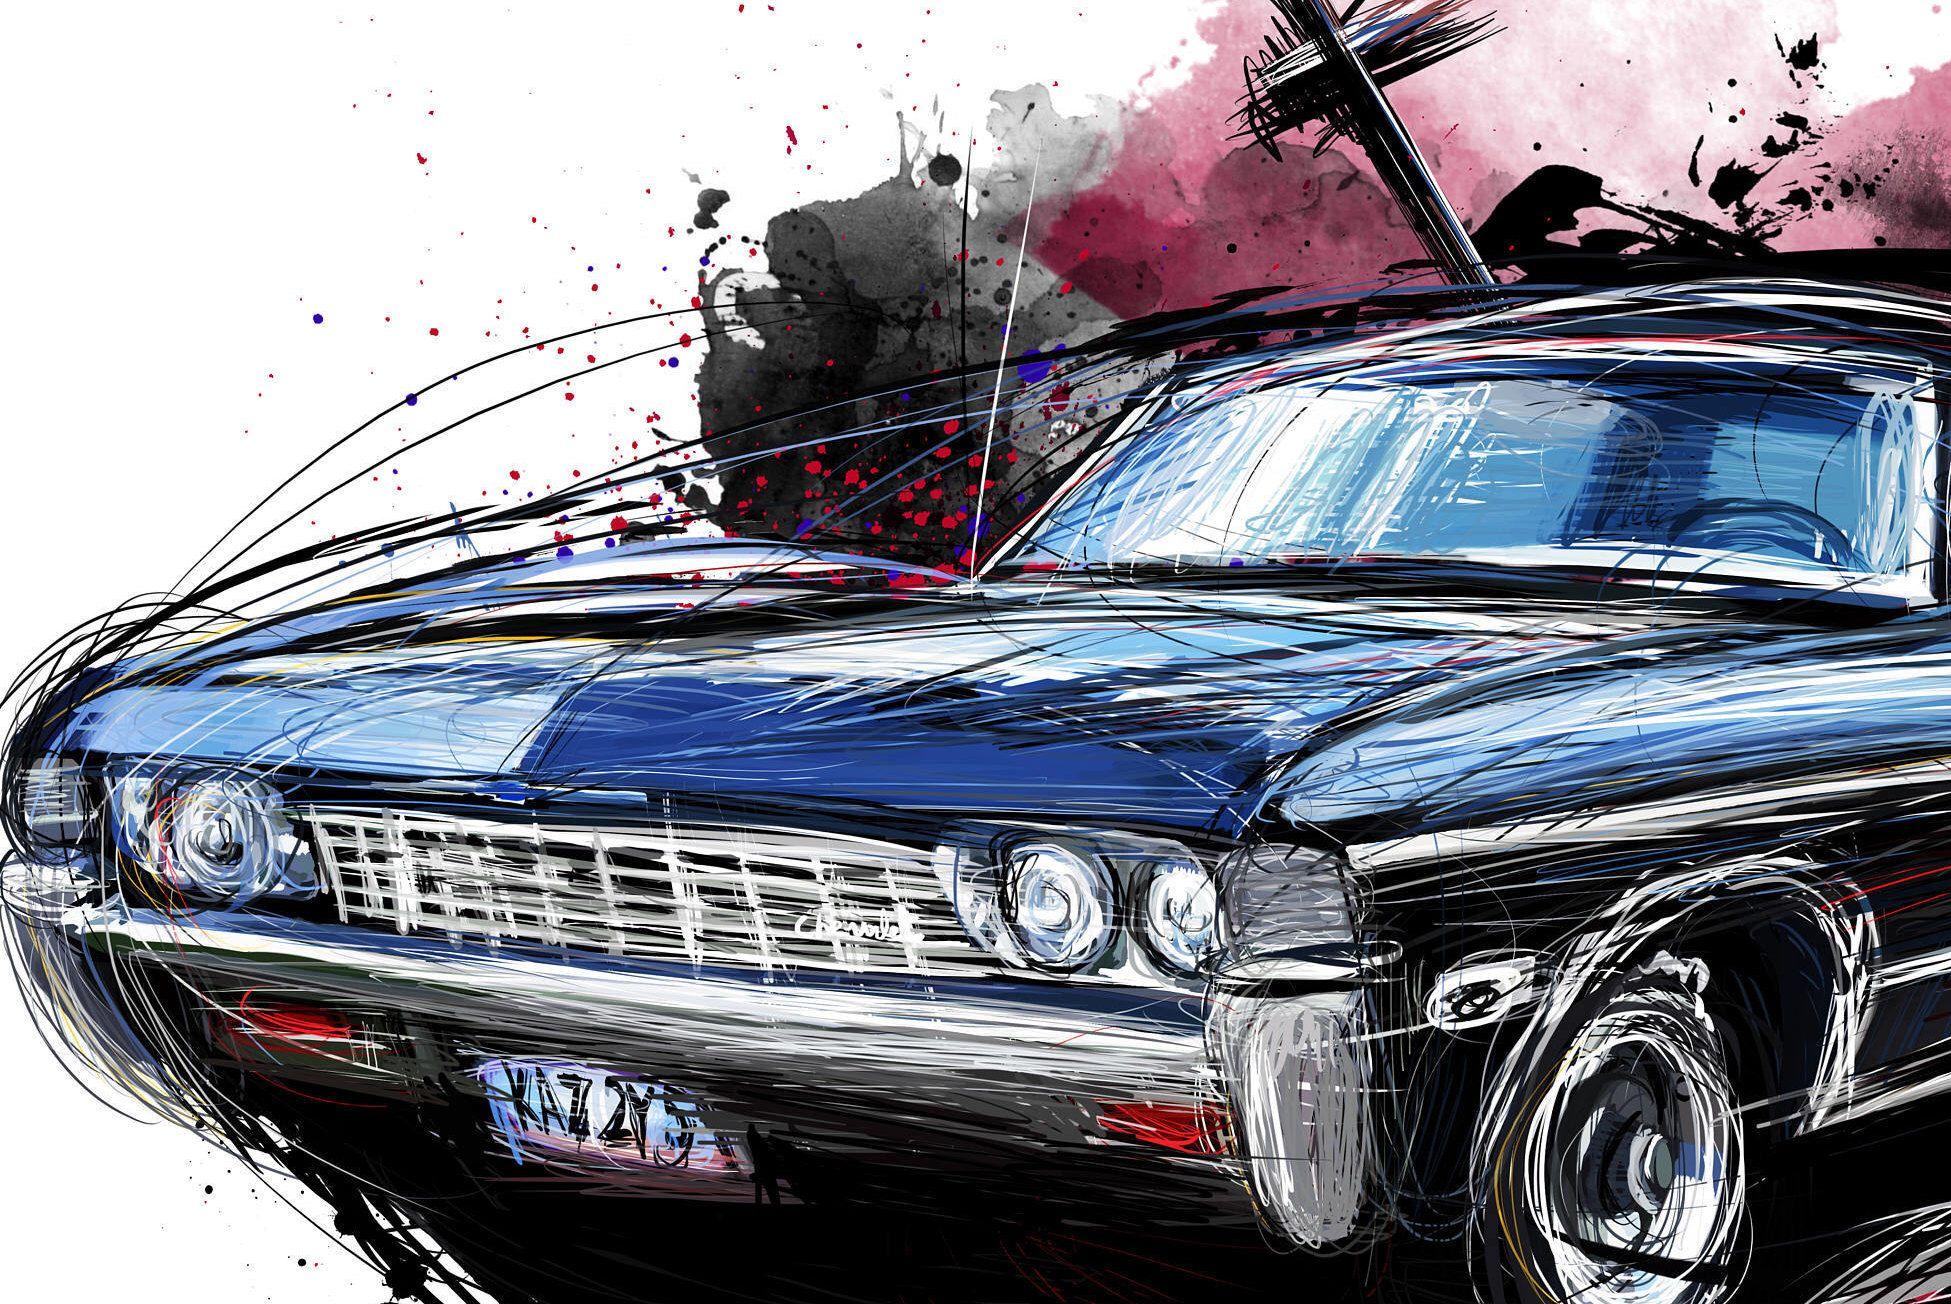 Supernatural Baby 1967 Chevy Impala Wood Art Panel 11x17